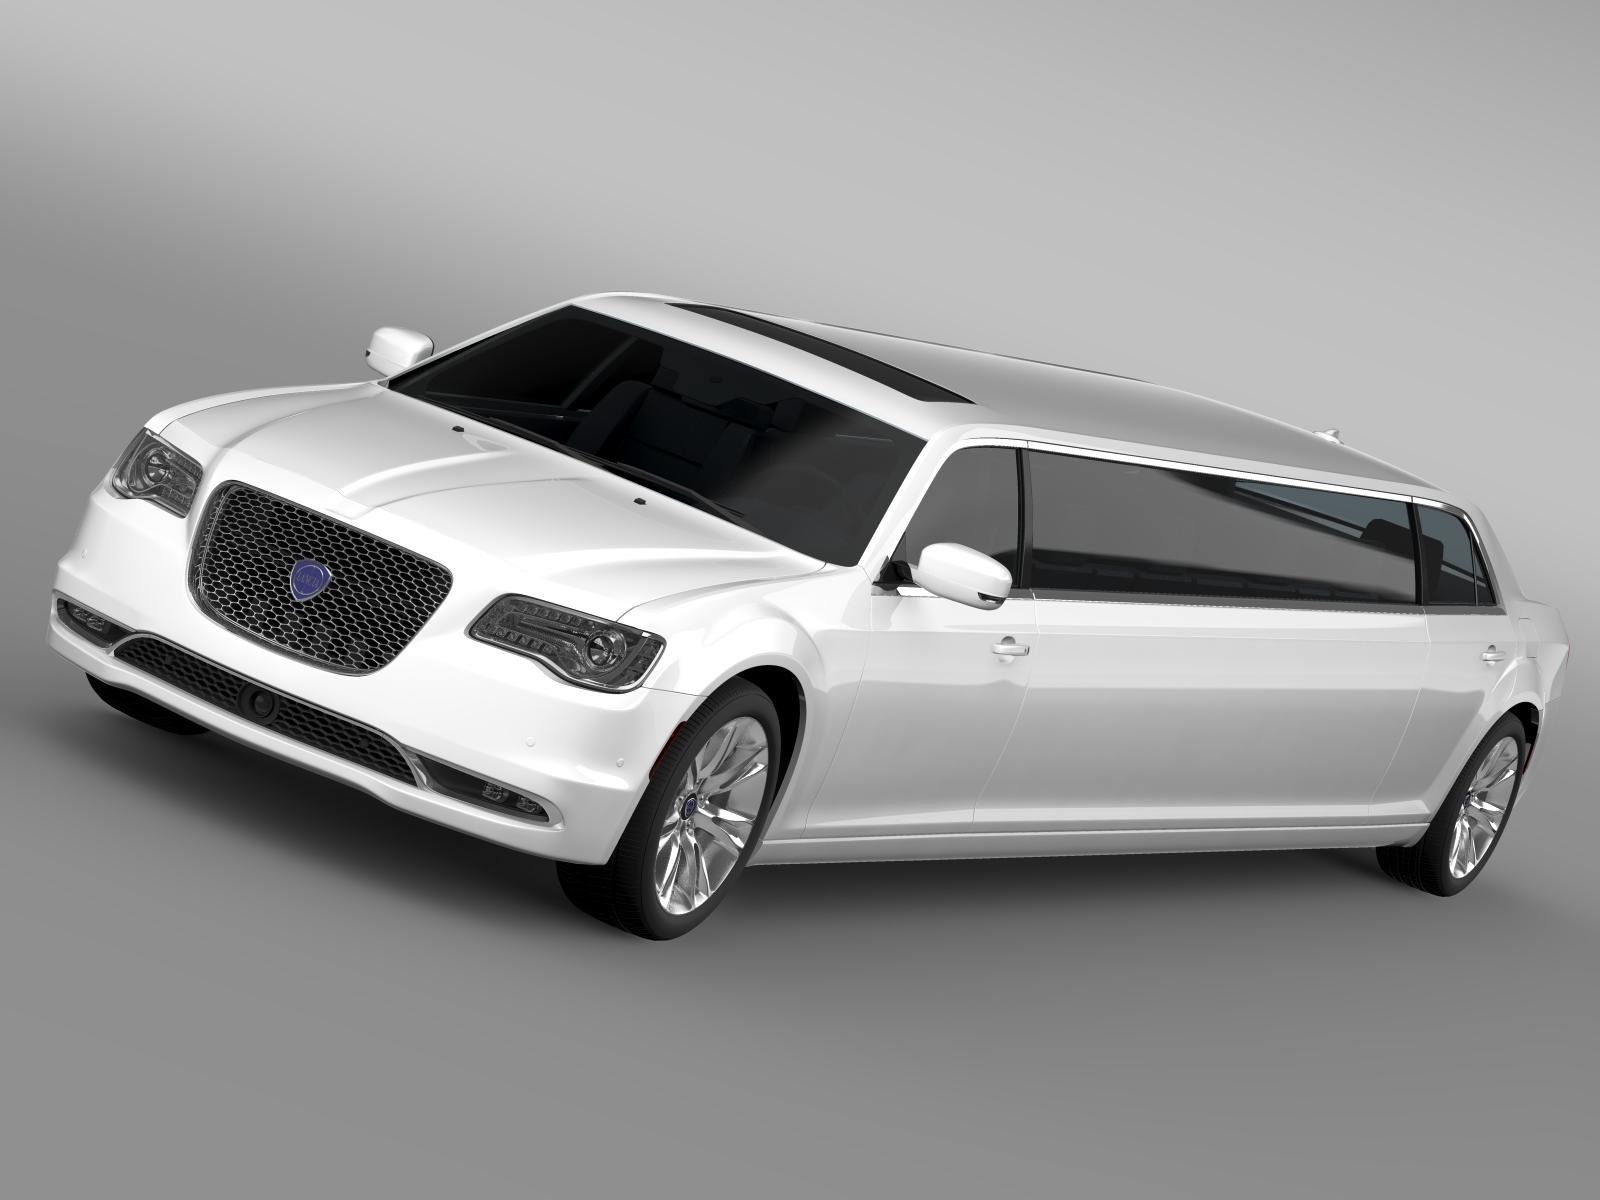 lancia thema limousine 2016 3d model 3ds max fbx c4d ar gyfer yr hrc xsi obj